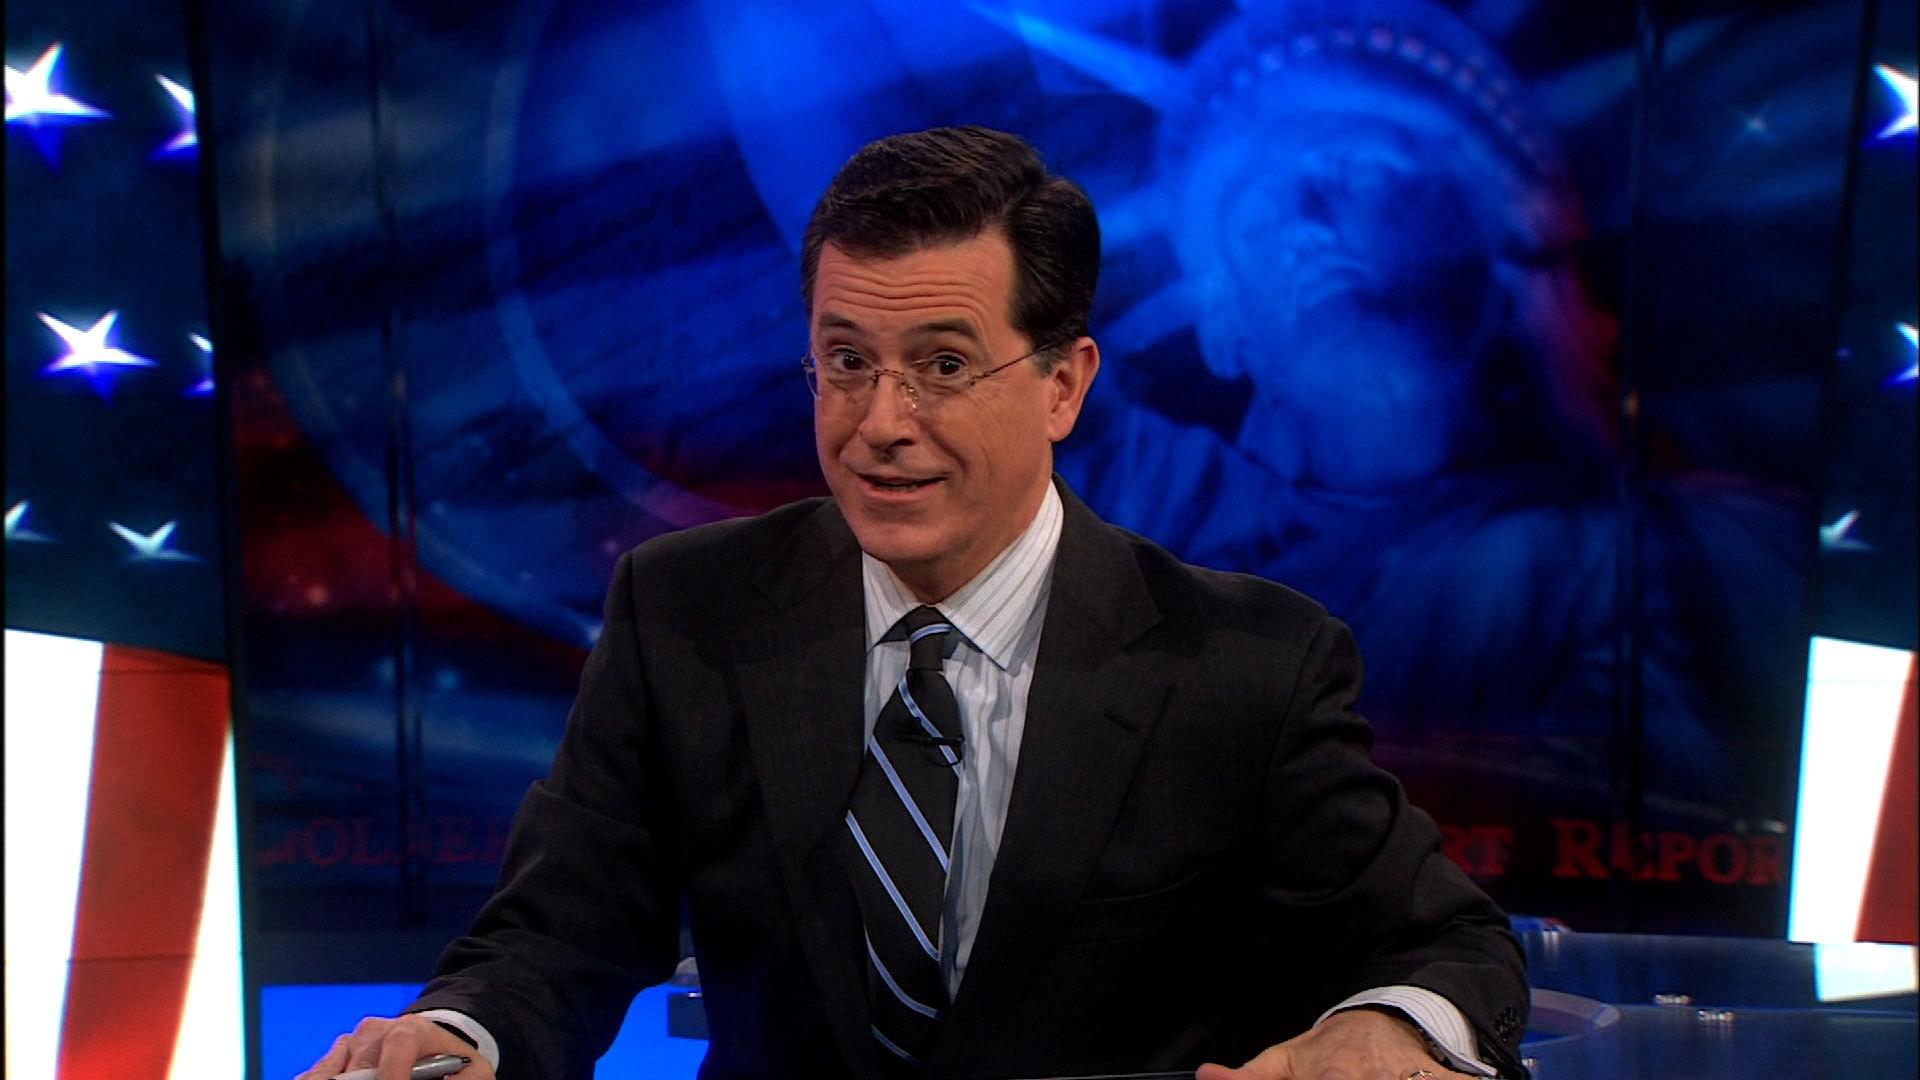 Stephen Colbert HD Background